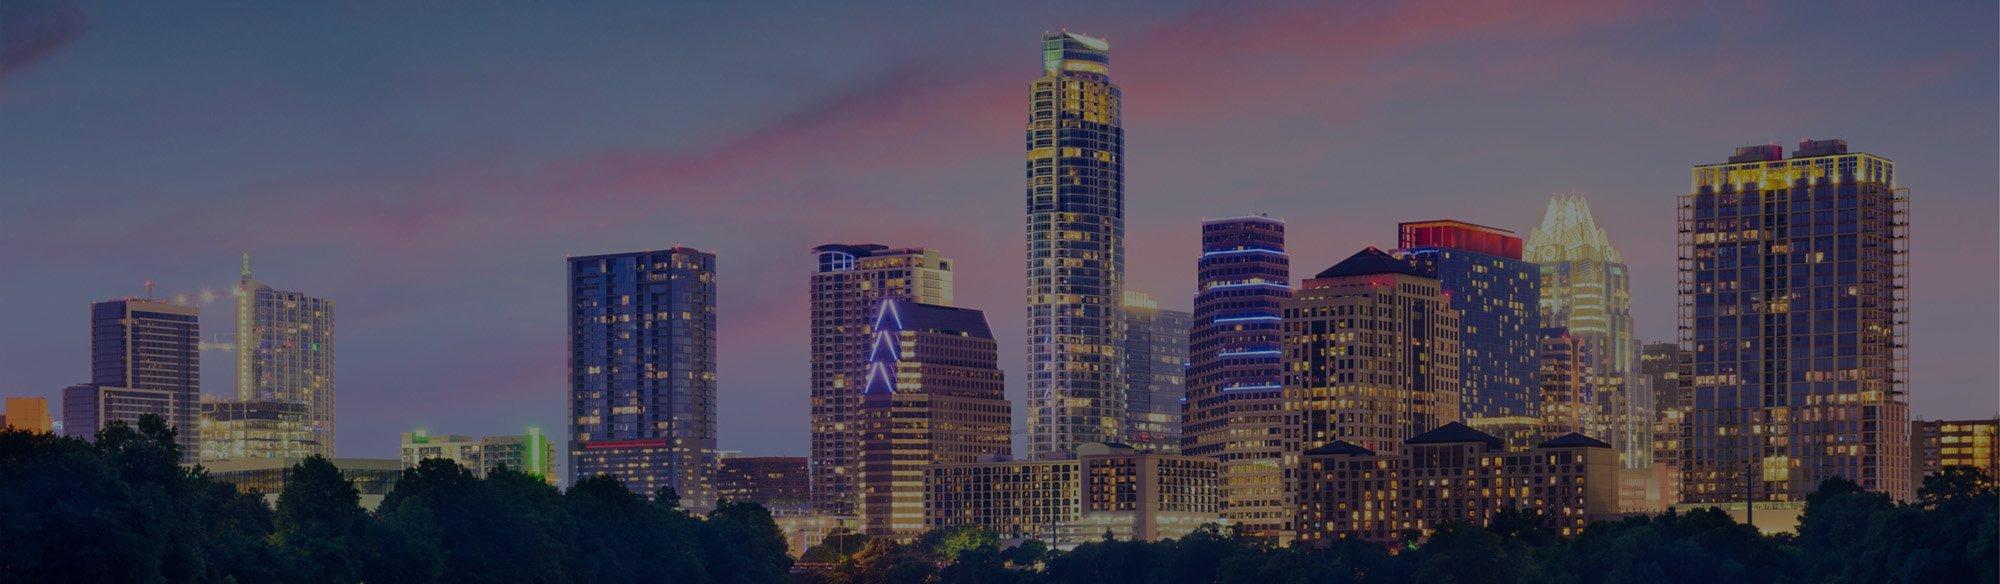 austin-skyline-lit-up-dusk-colvin-electric